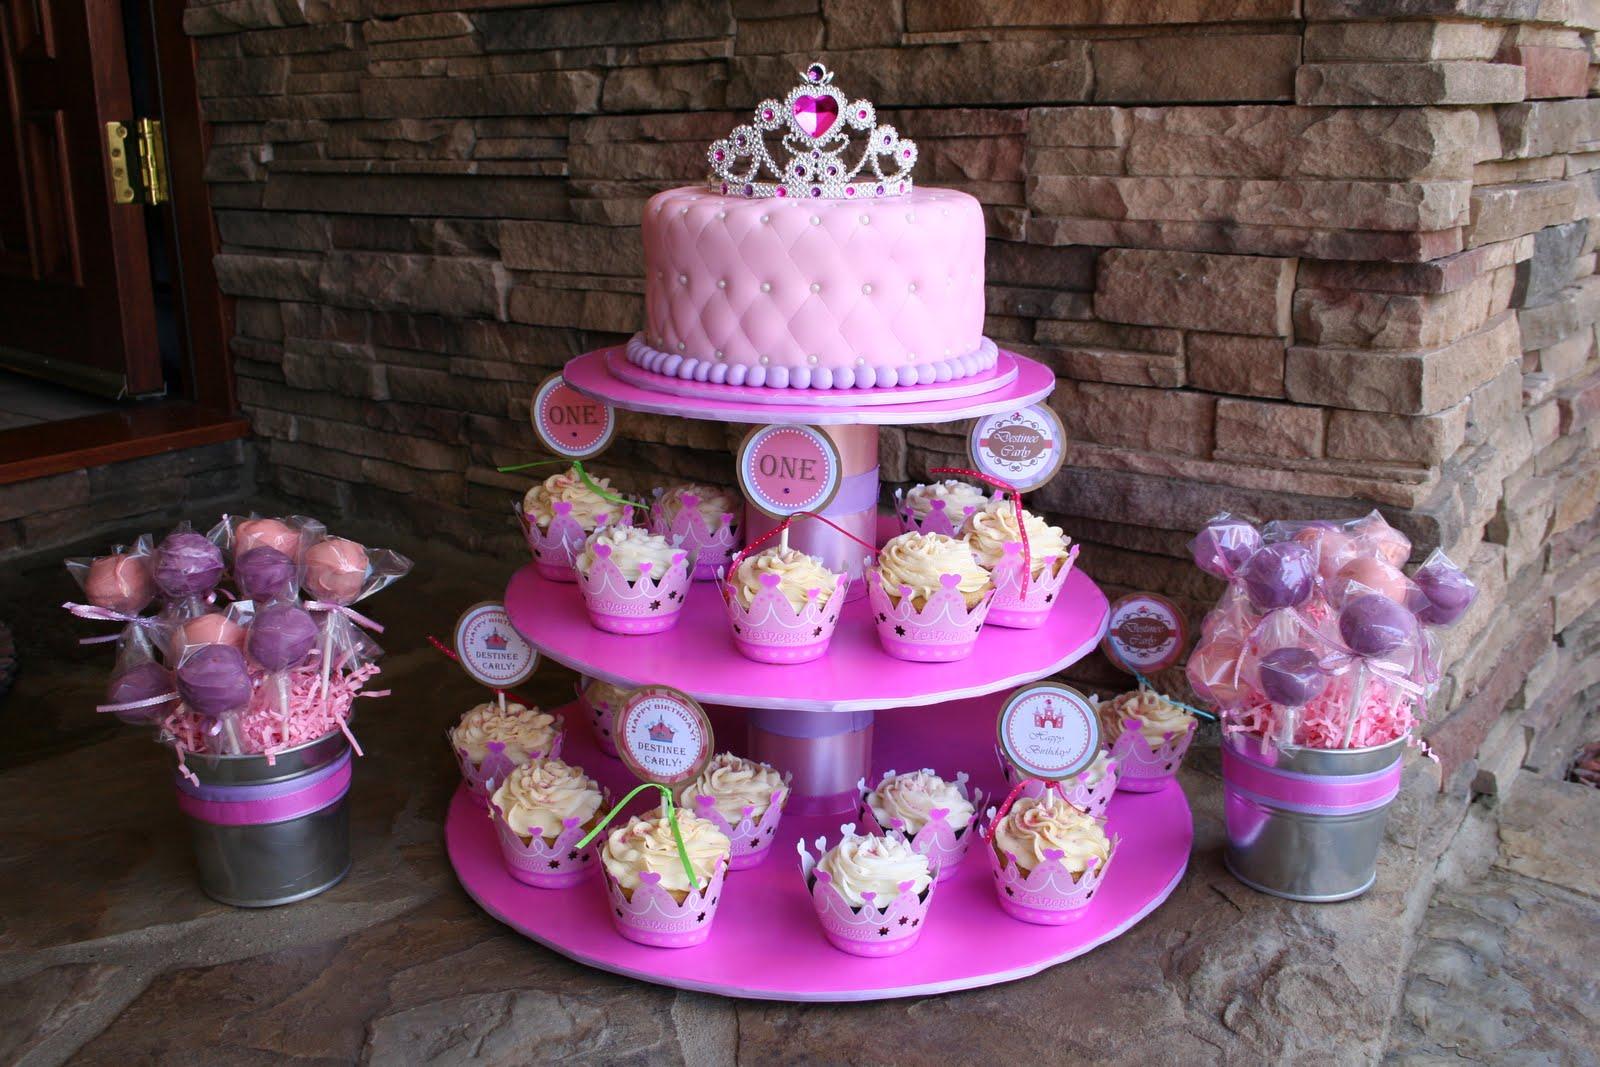 Sensational 9 Princess Birthday Cakes Girls Cupcake Photo Princess Cupcake Funny Birthday Cards Online Inifodamsfinfo